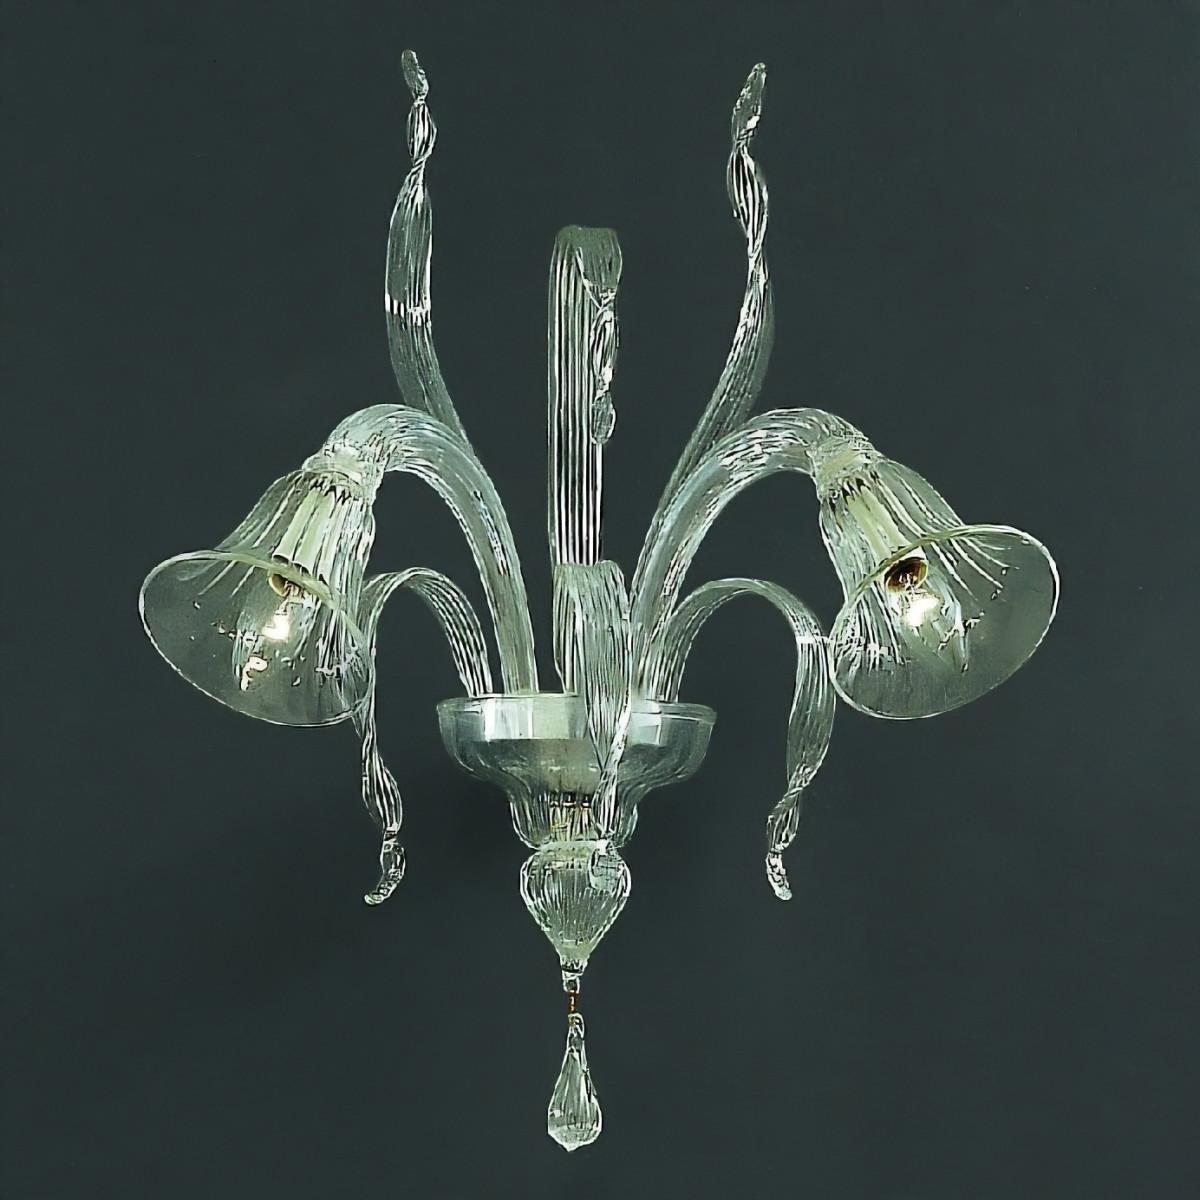 Rialto 2 lumières de couleur Murano Applique transparente